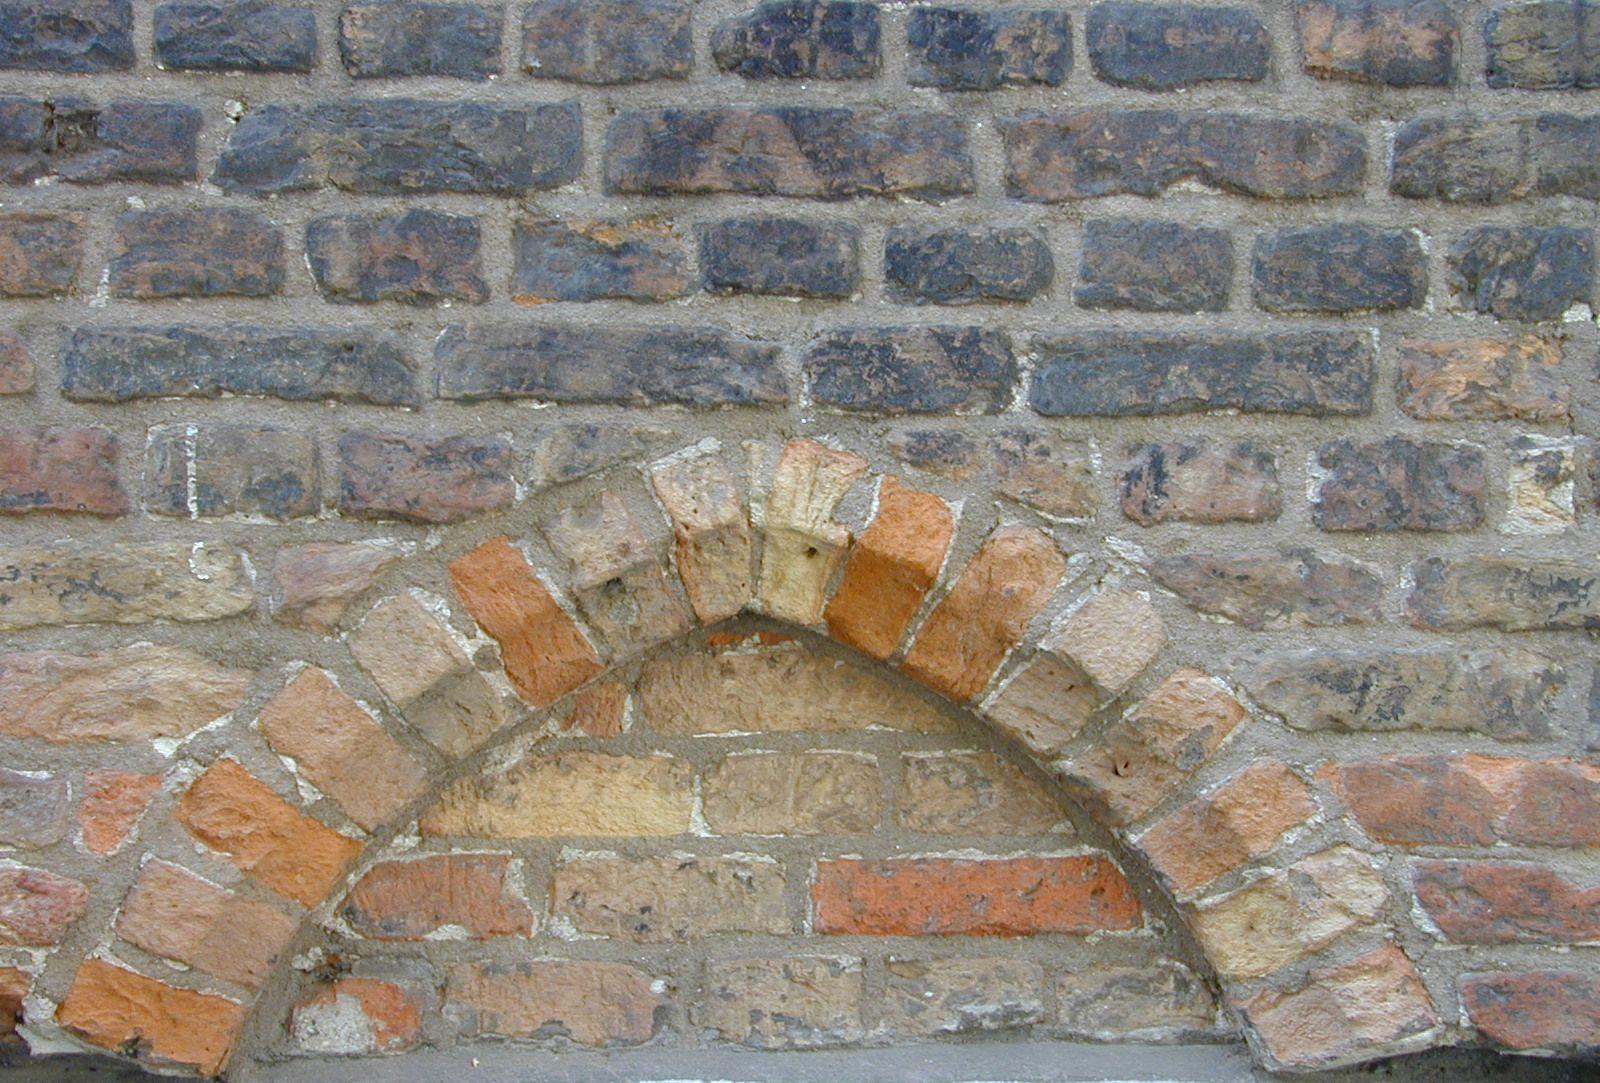 ornament cement door top bricks masonry red royalty